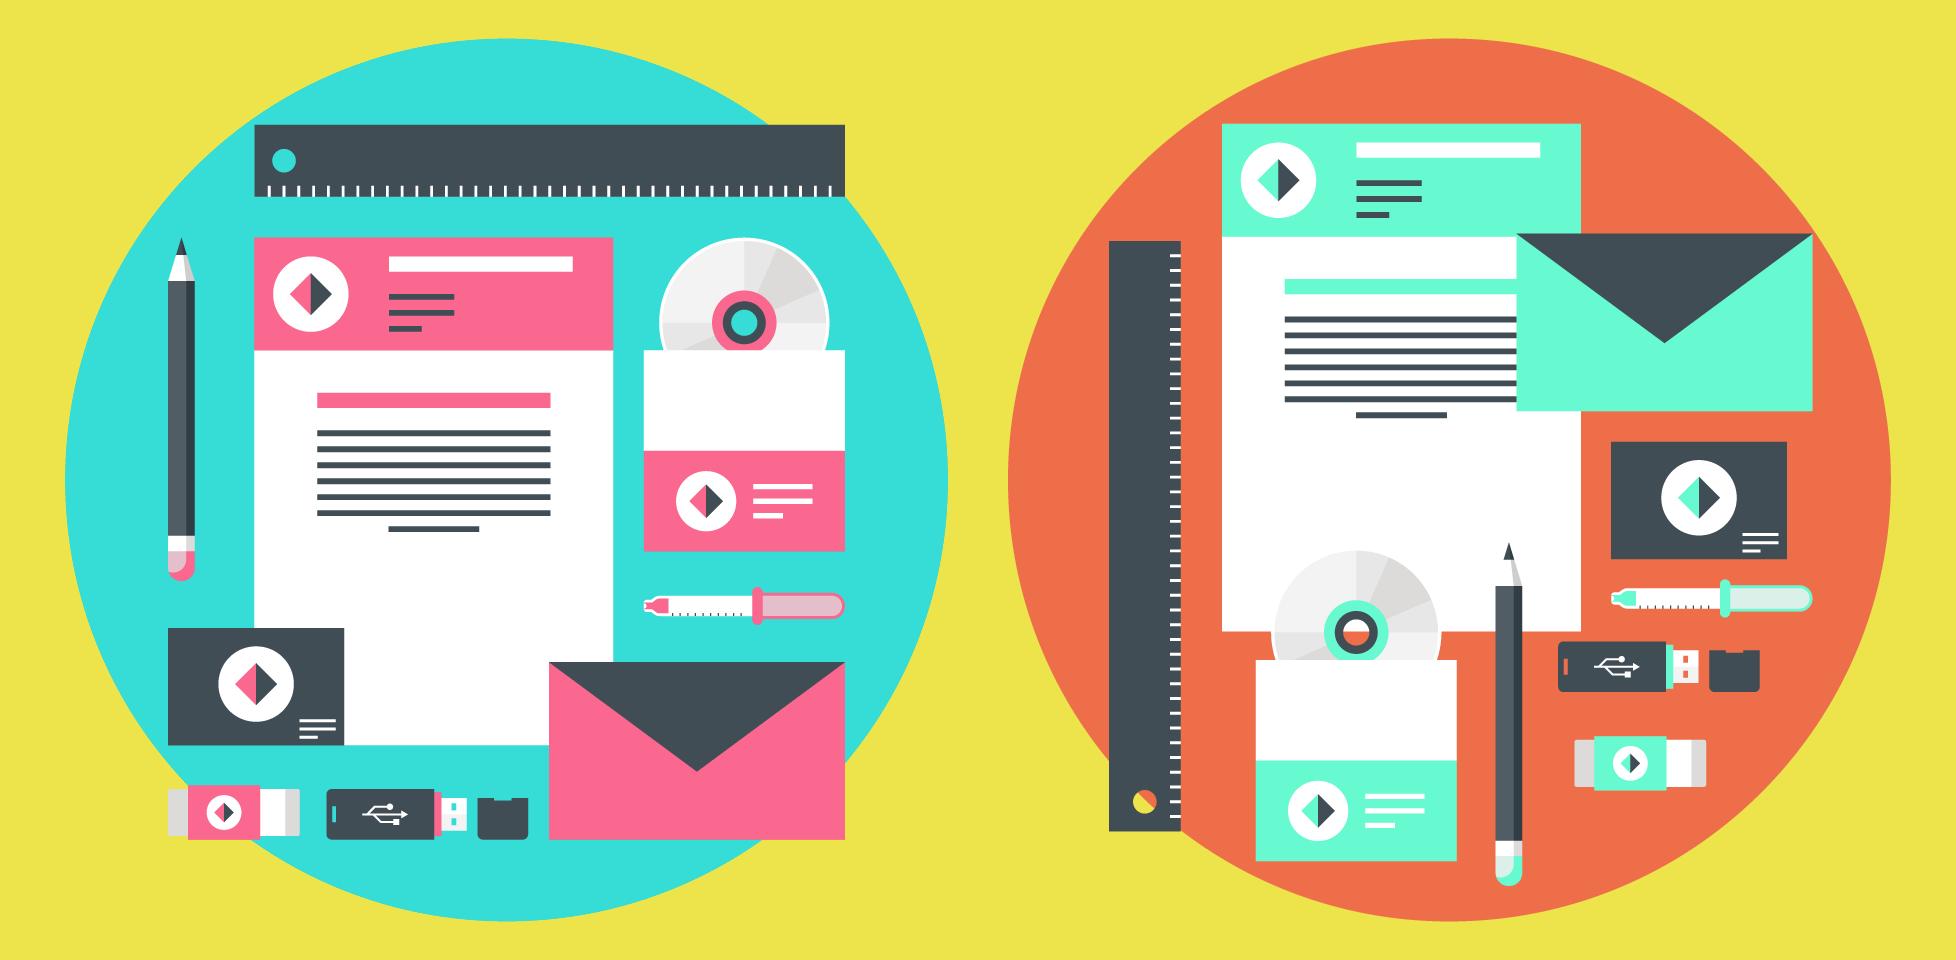 Sub-branding vs. brand fragmentation, which should you choose?